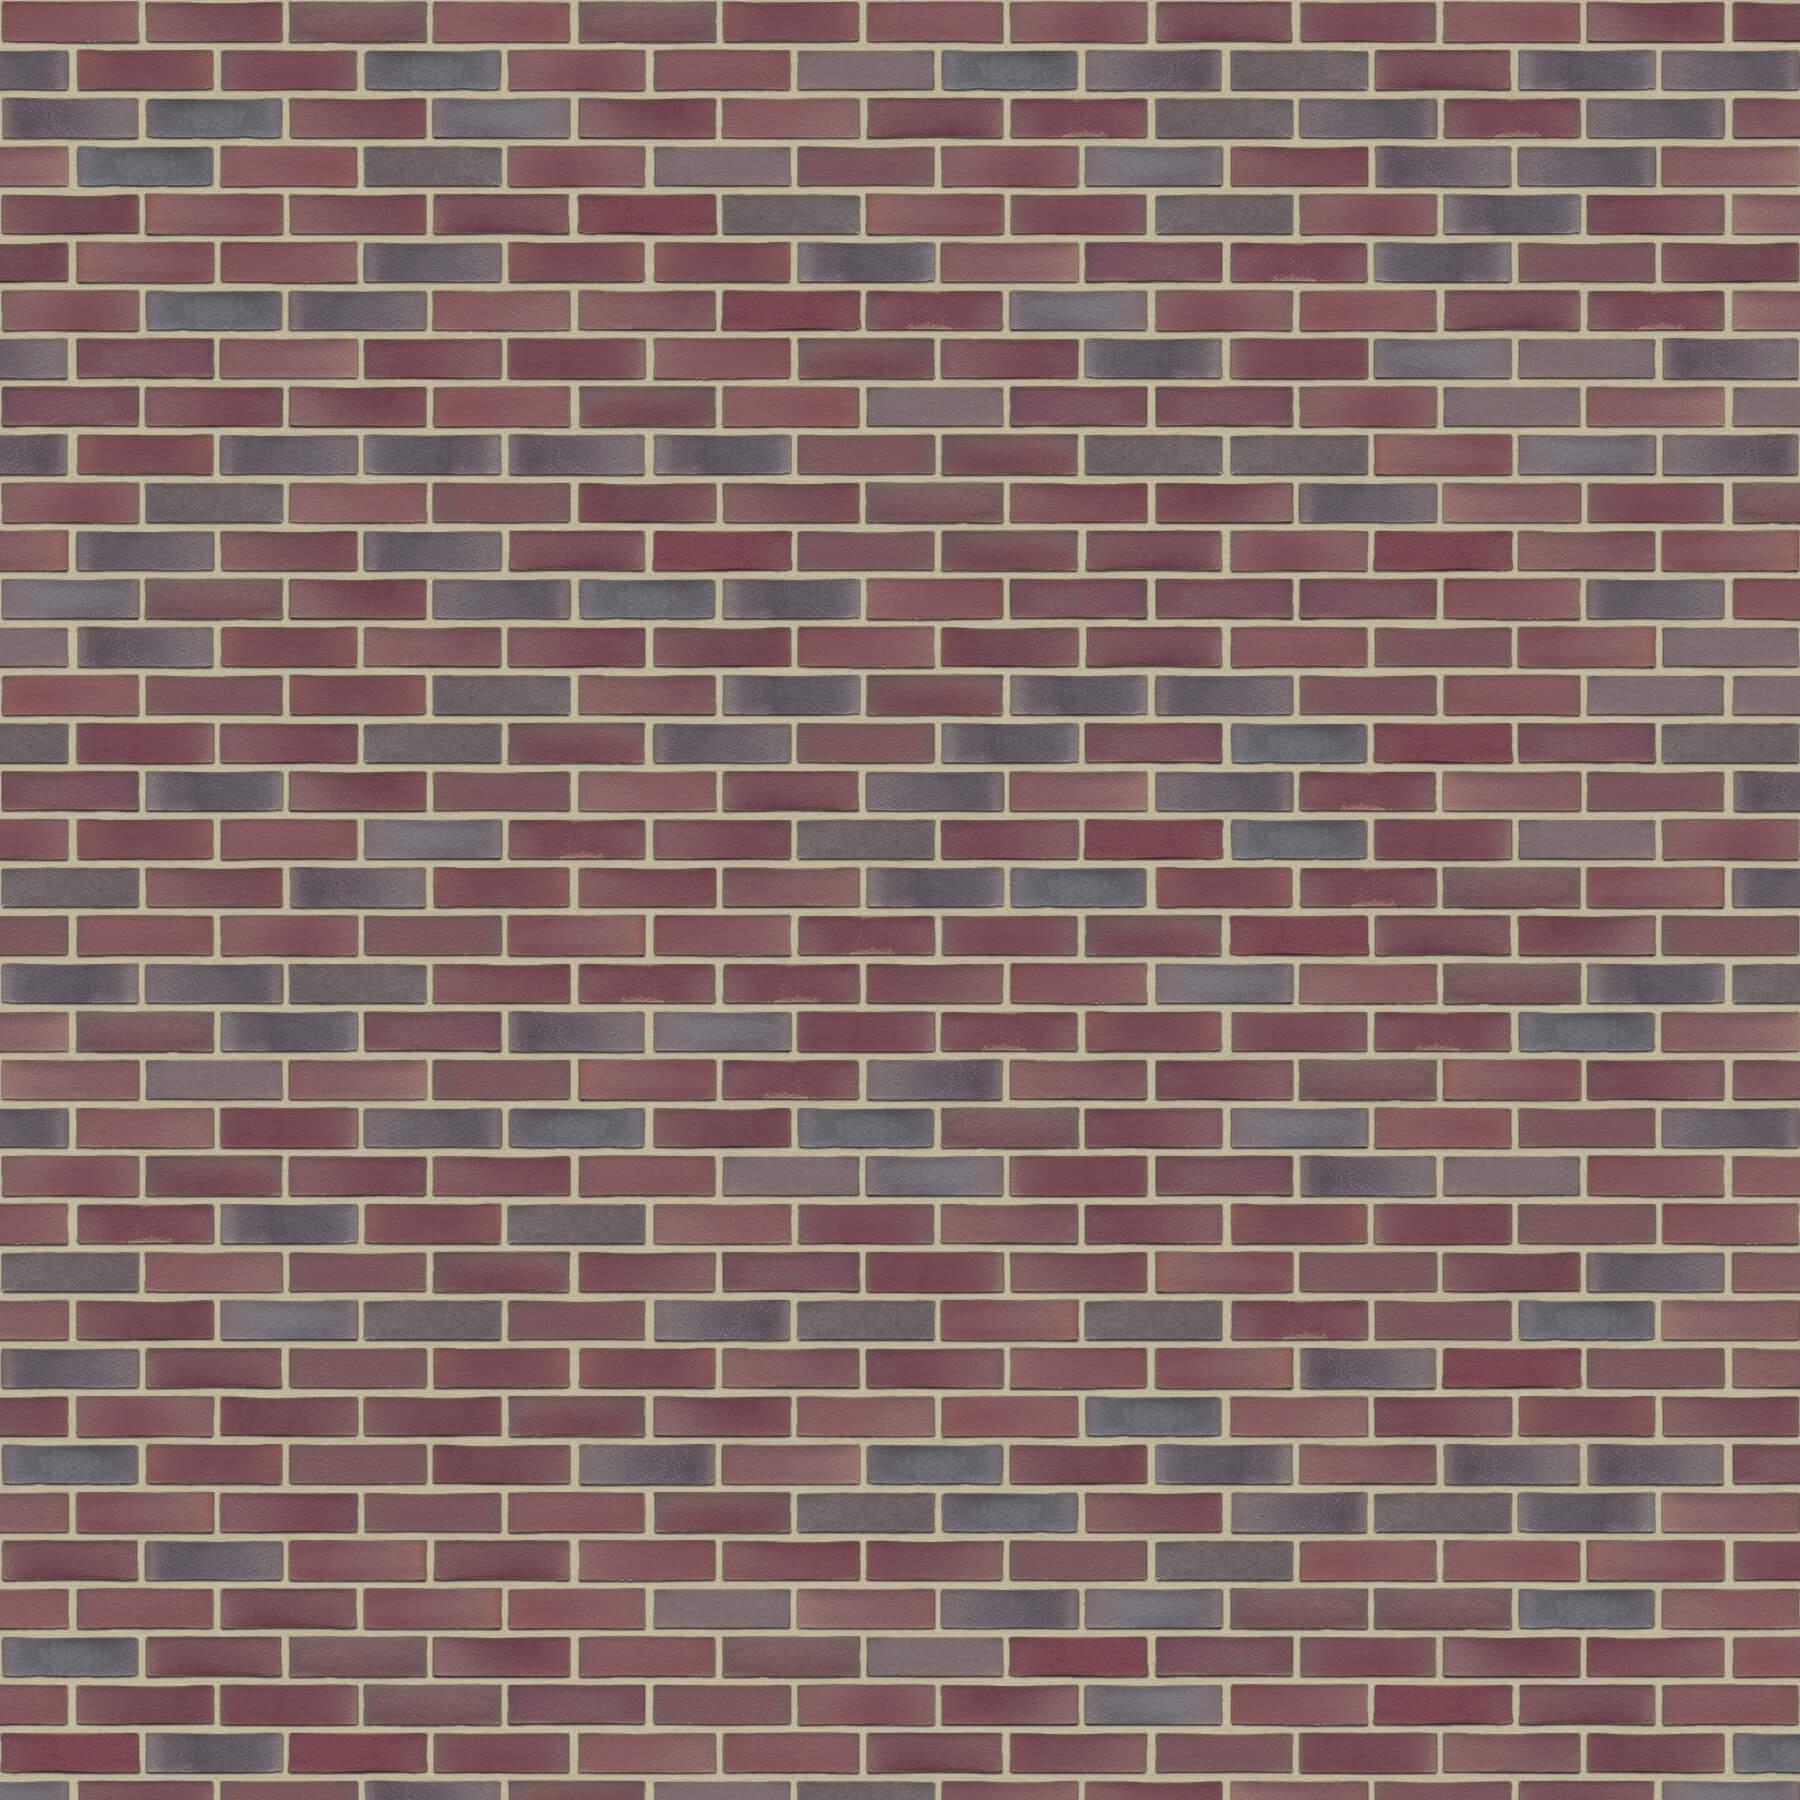 Puna-cigla-FeldHaus-Klinker-brick-ho-beograd-nf-k-380-Bez Fuga